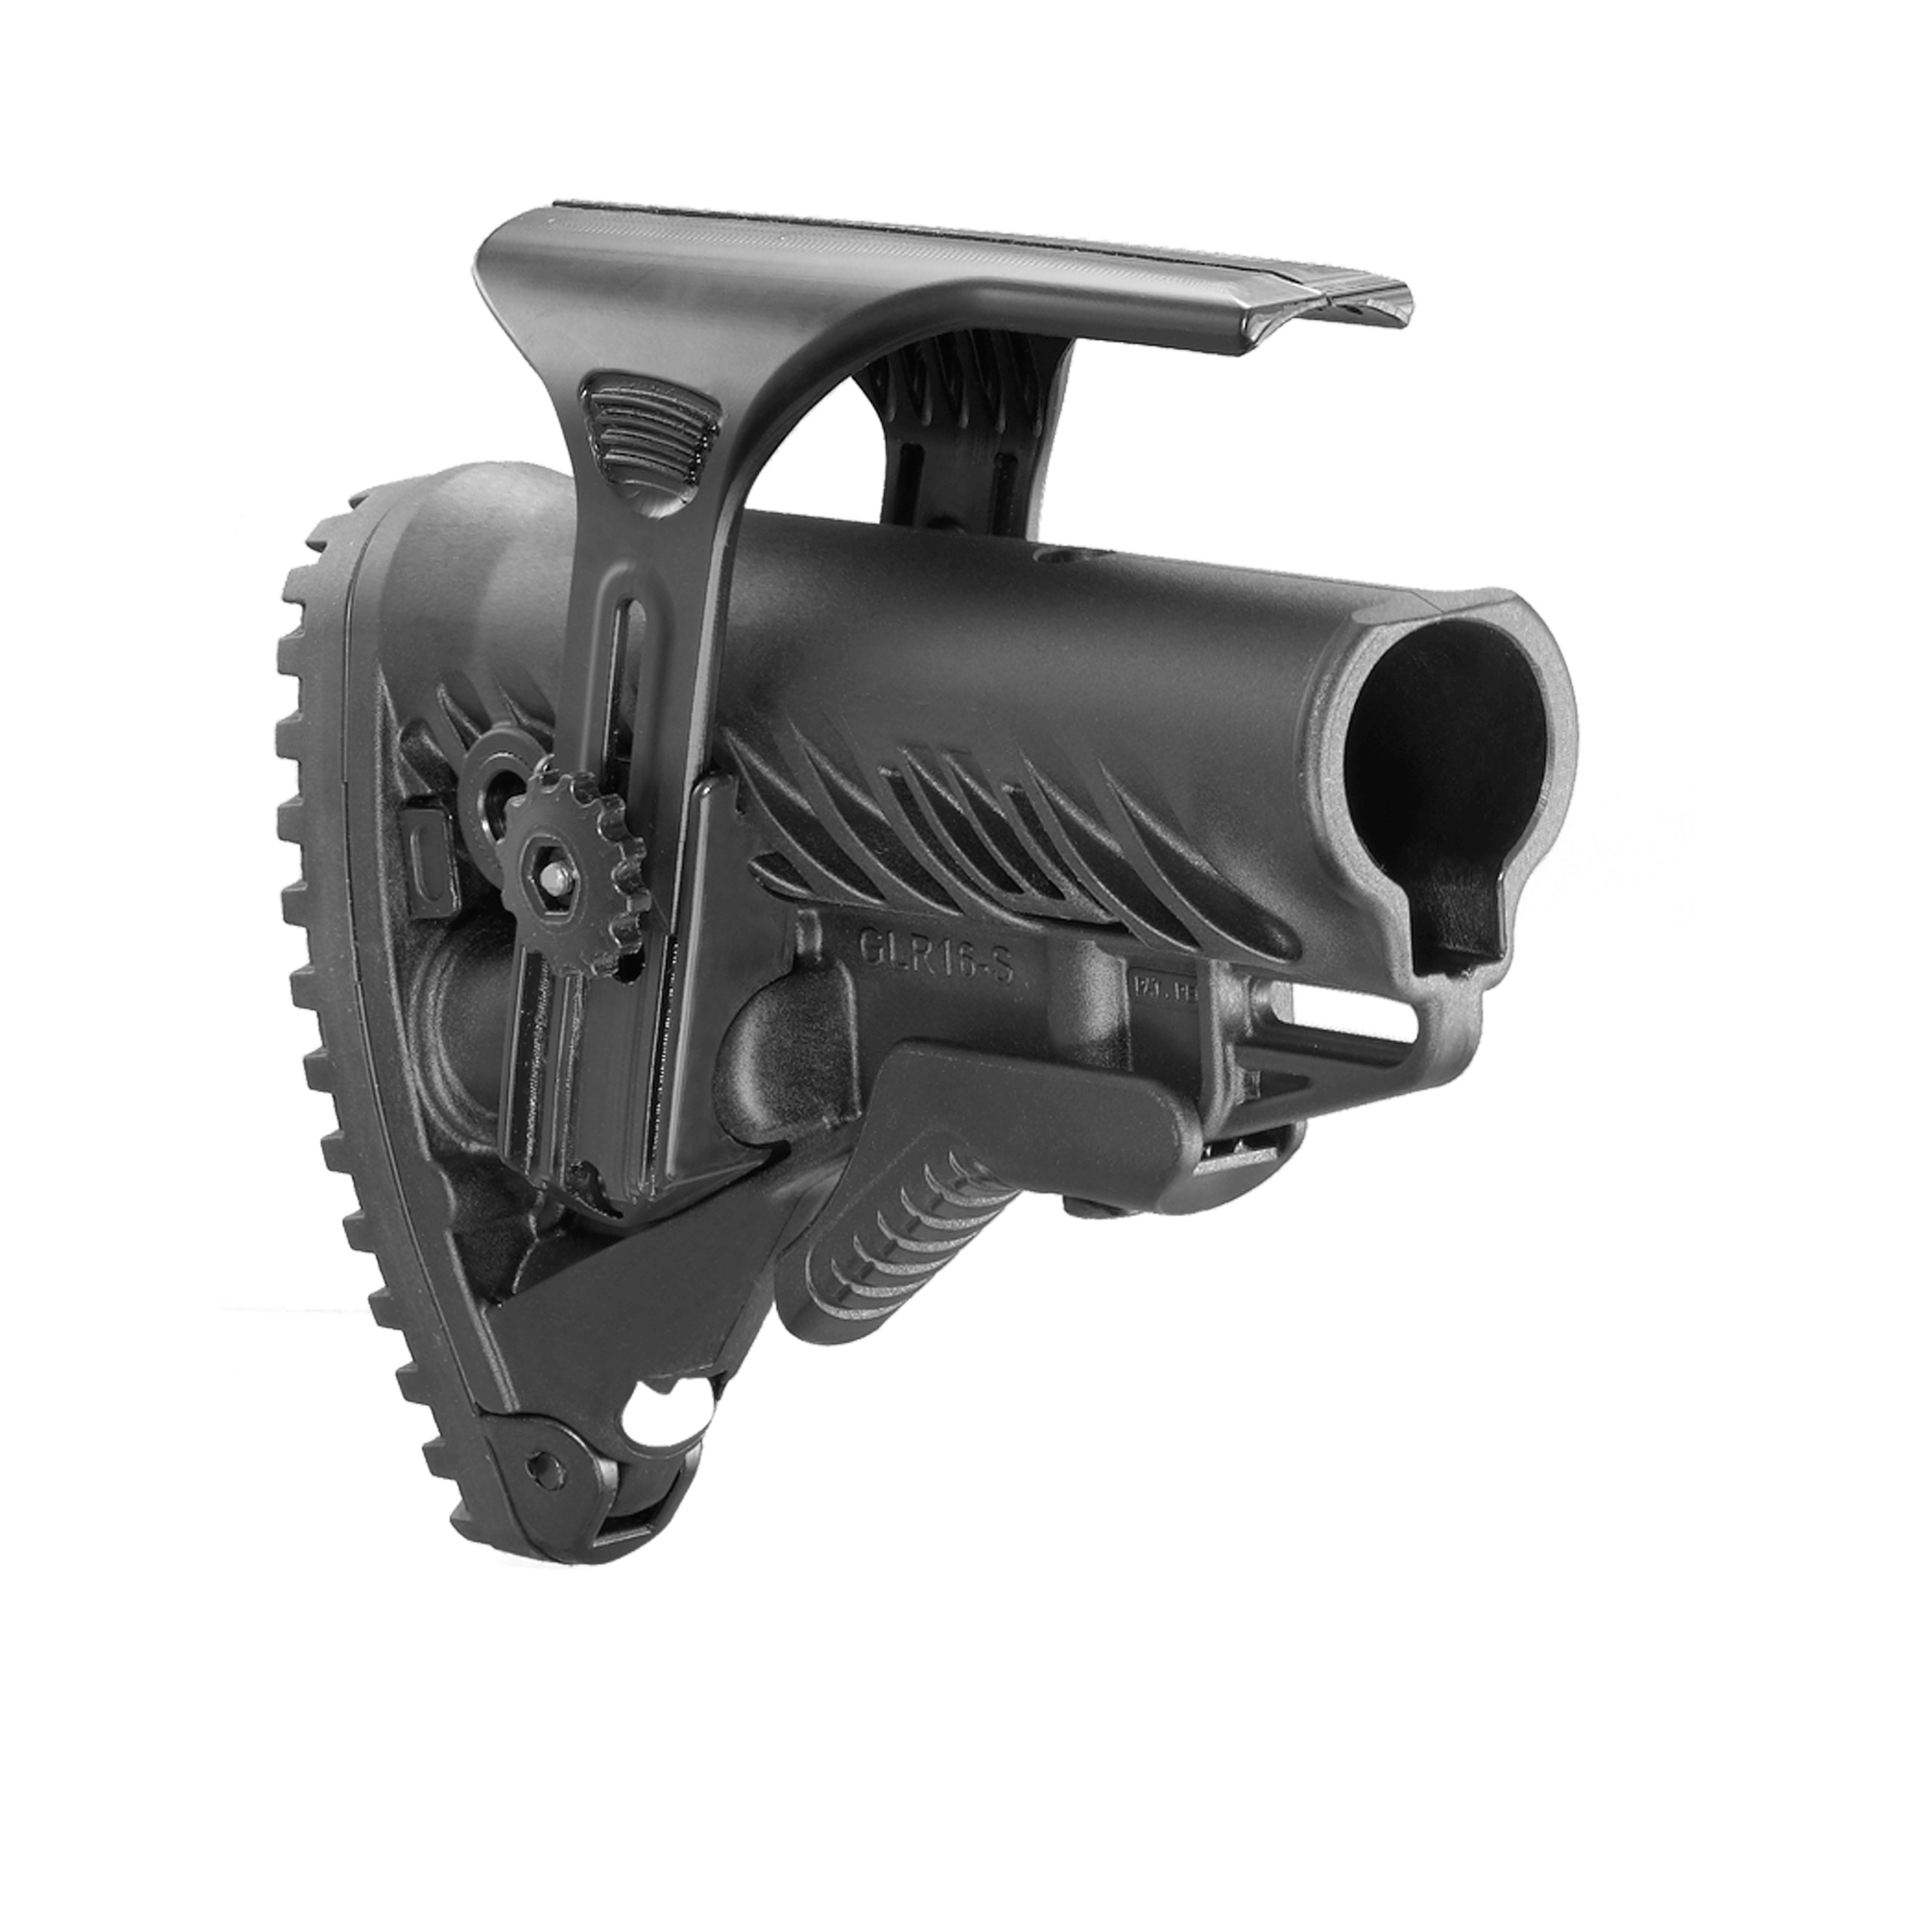 Buttstock AR15 / M16 / M4 Style - Cheek Rest